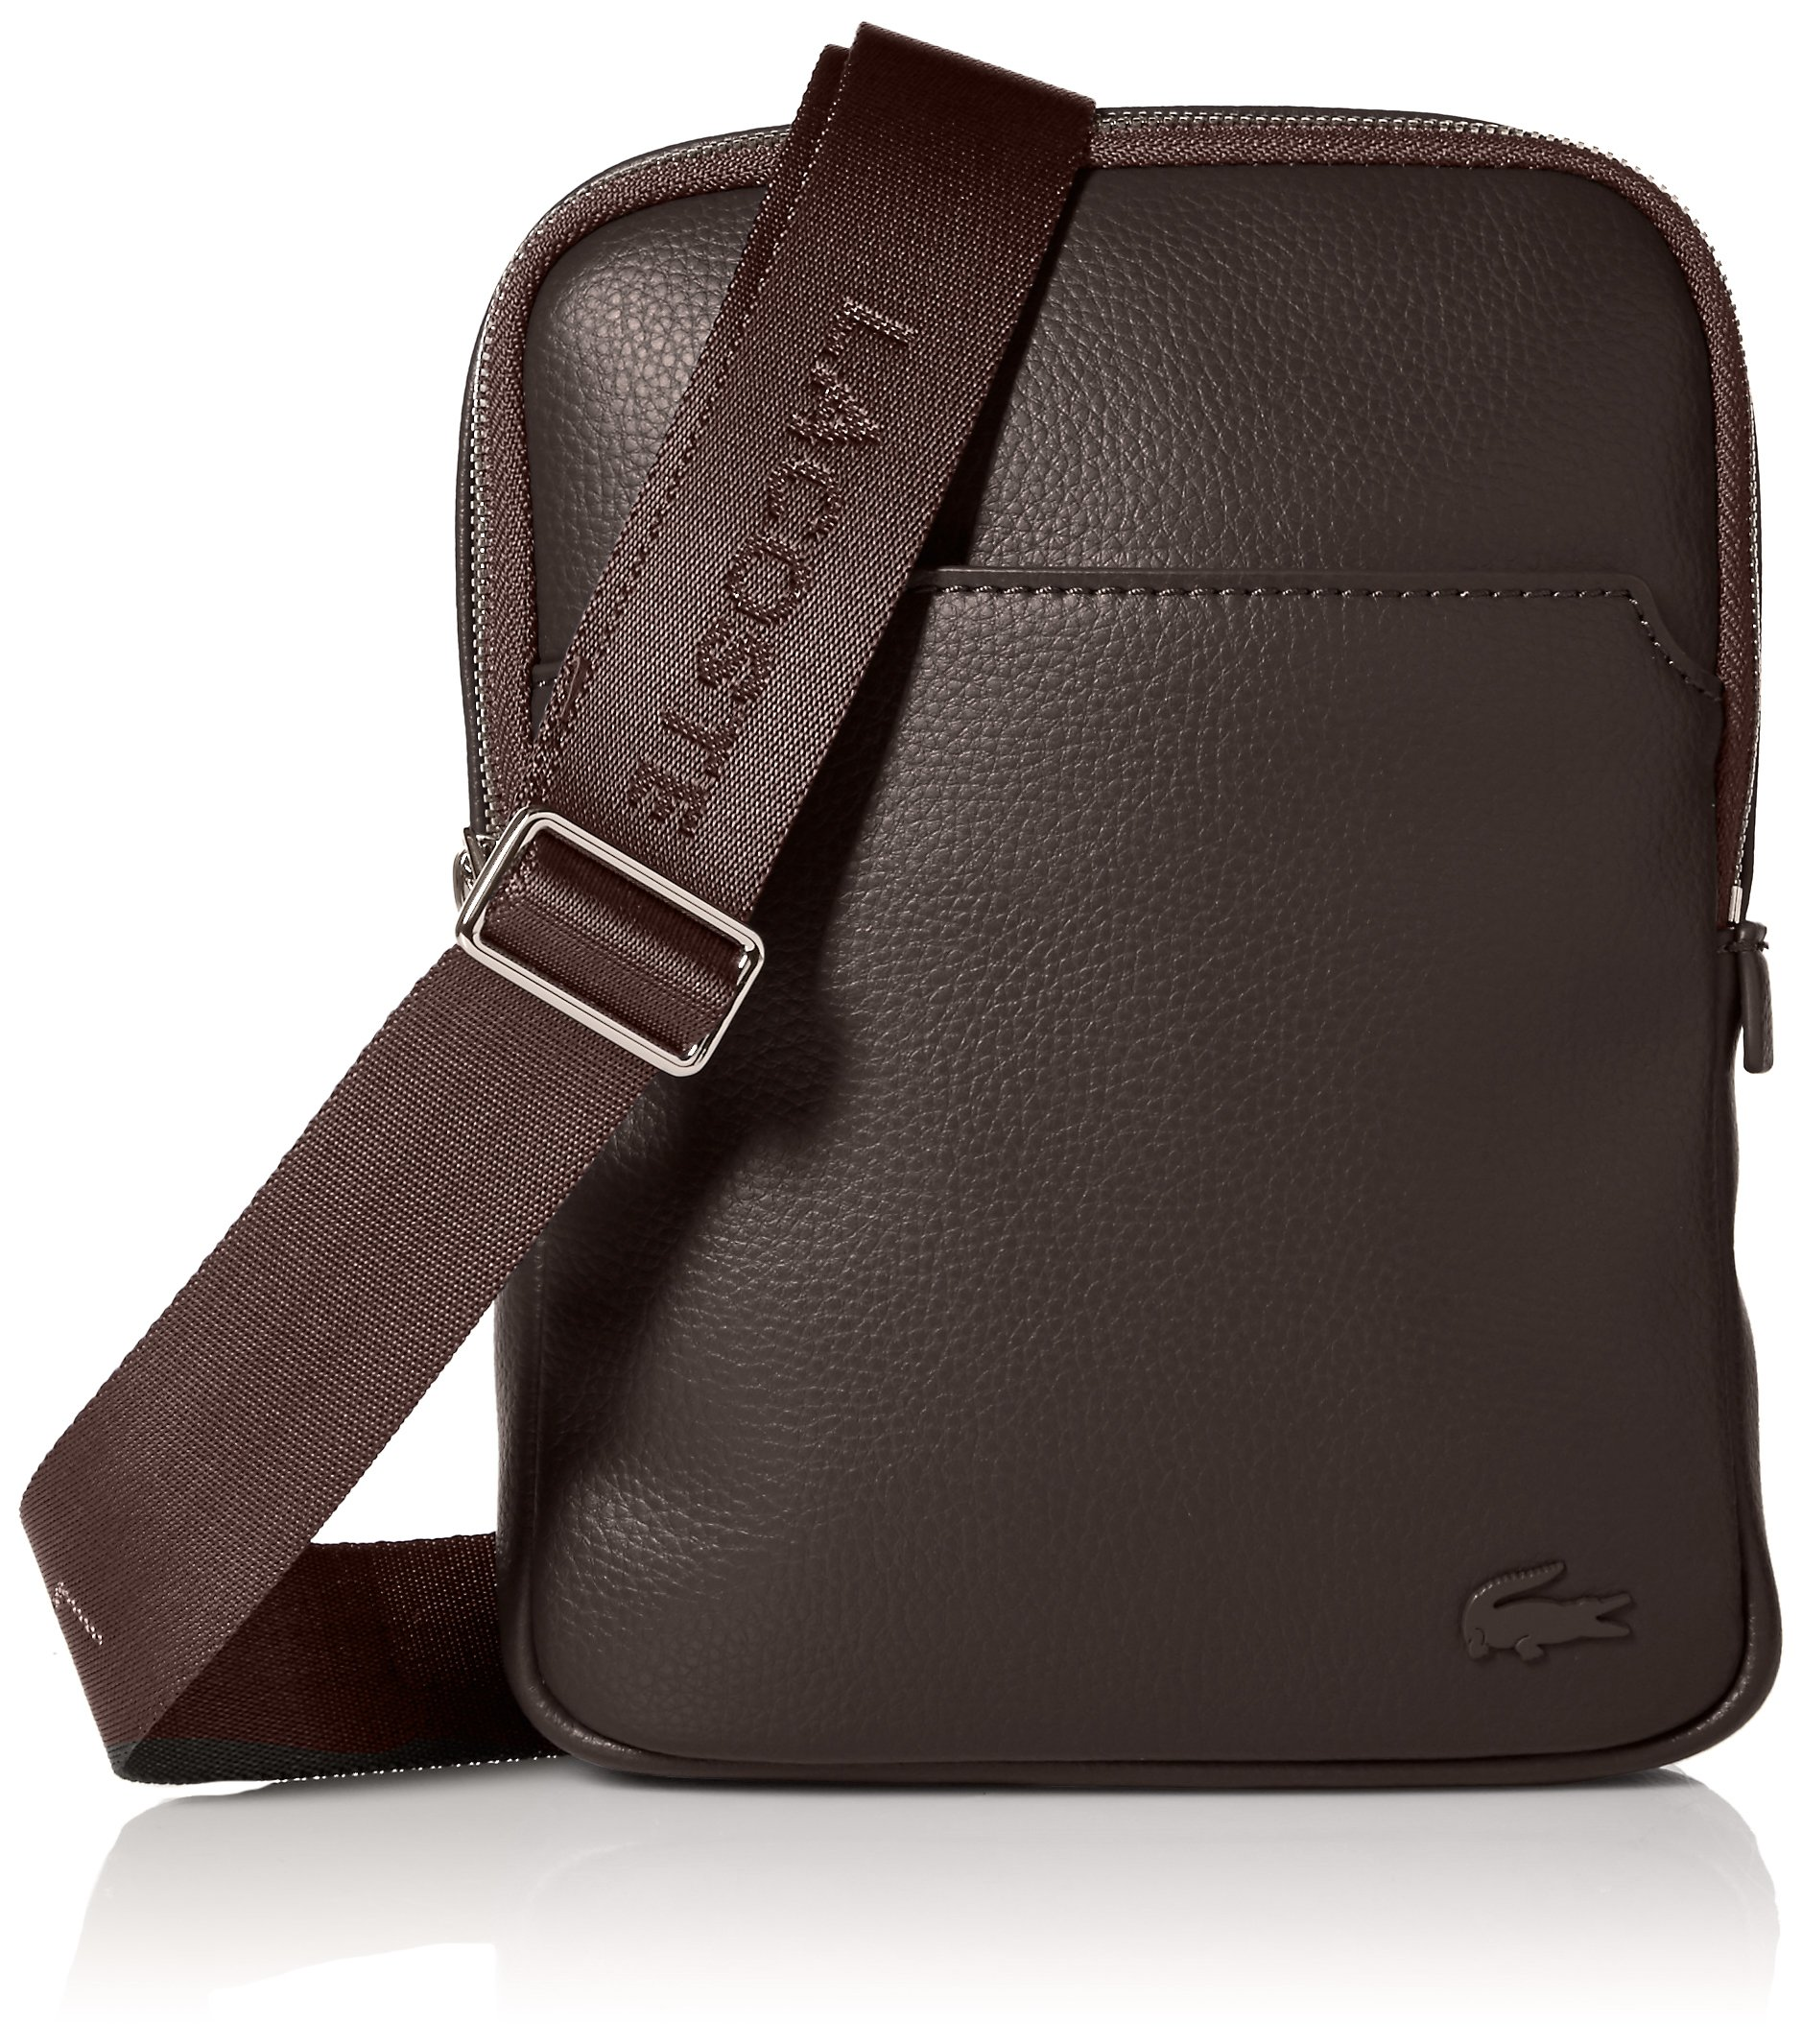 Lacoste Men's Gael Medium Flat Crossover Bag